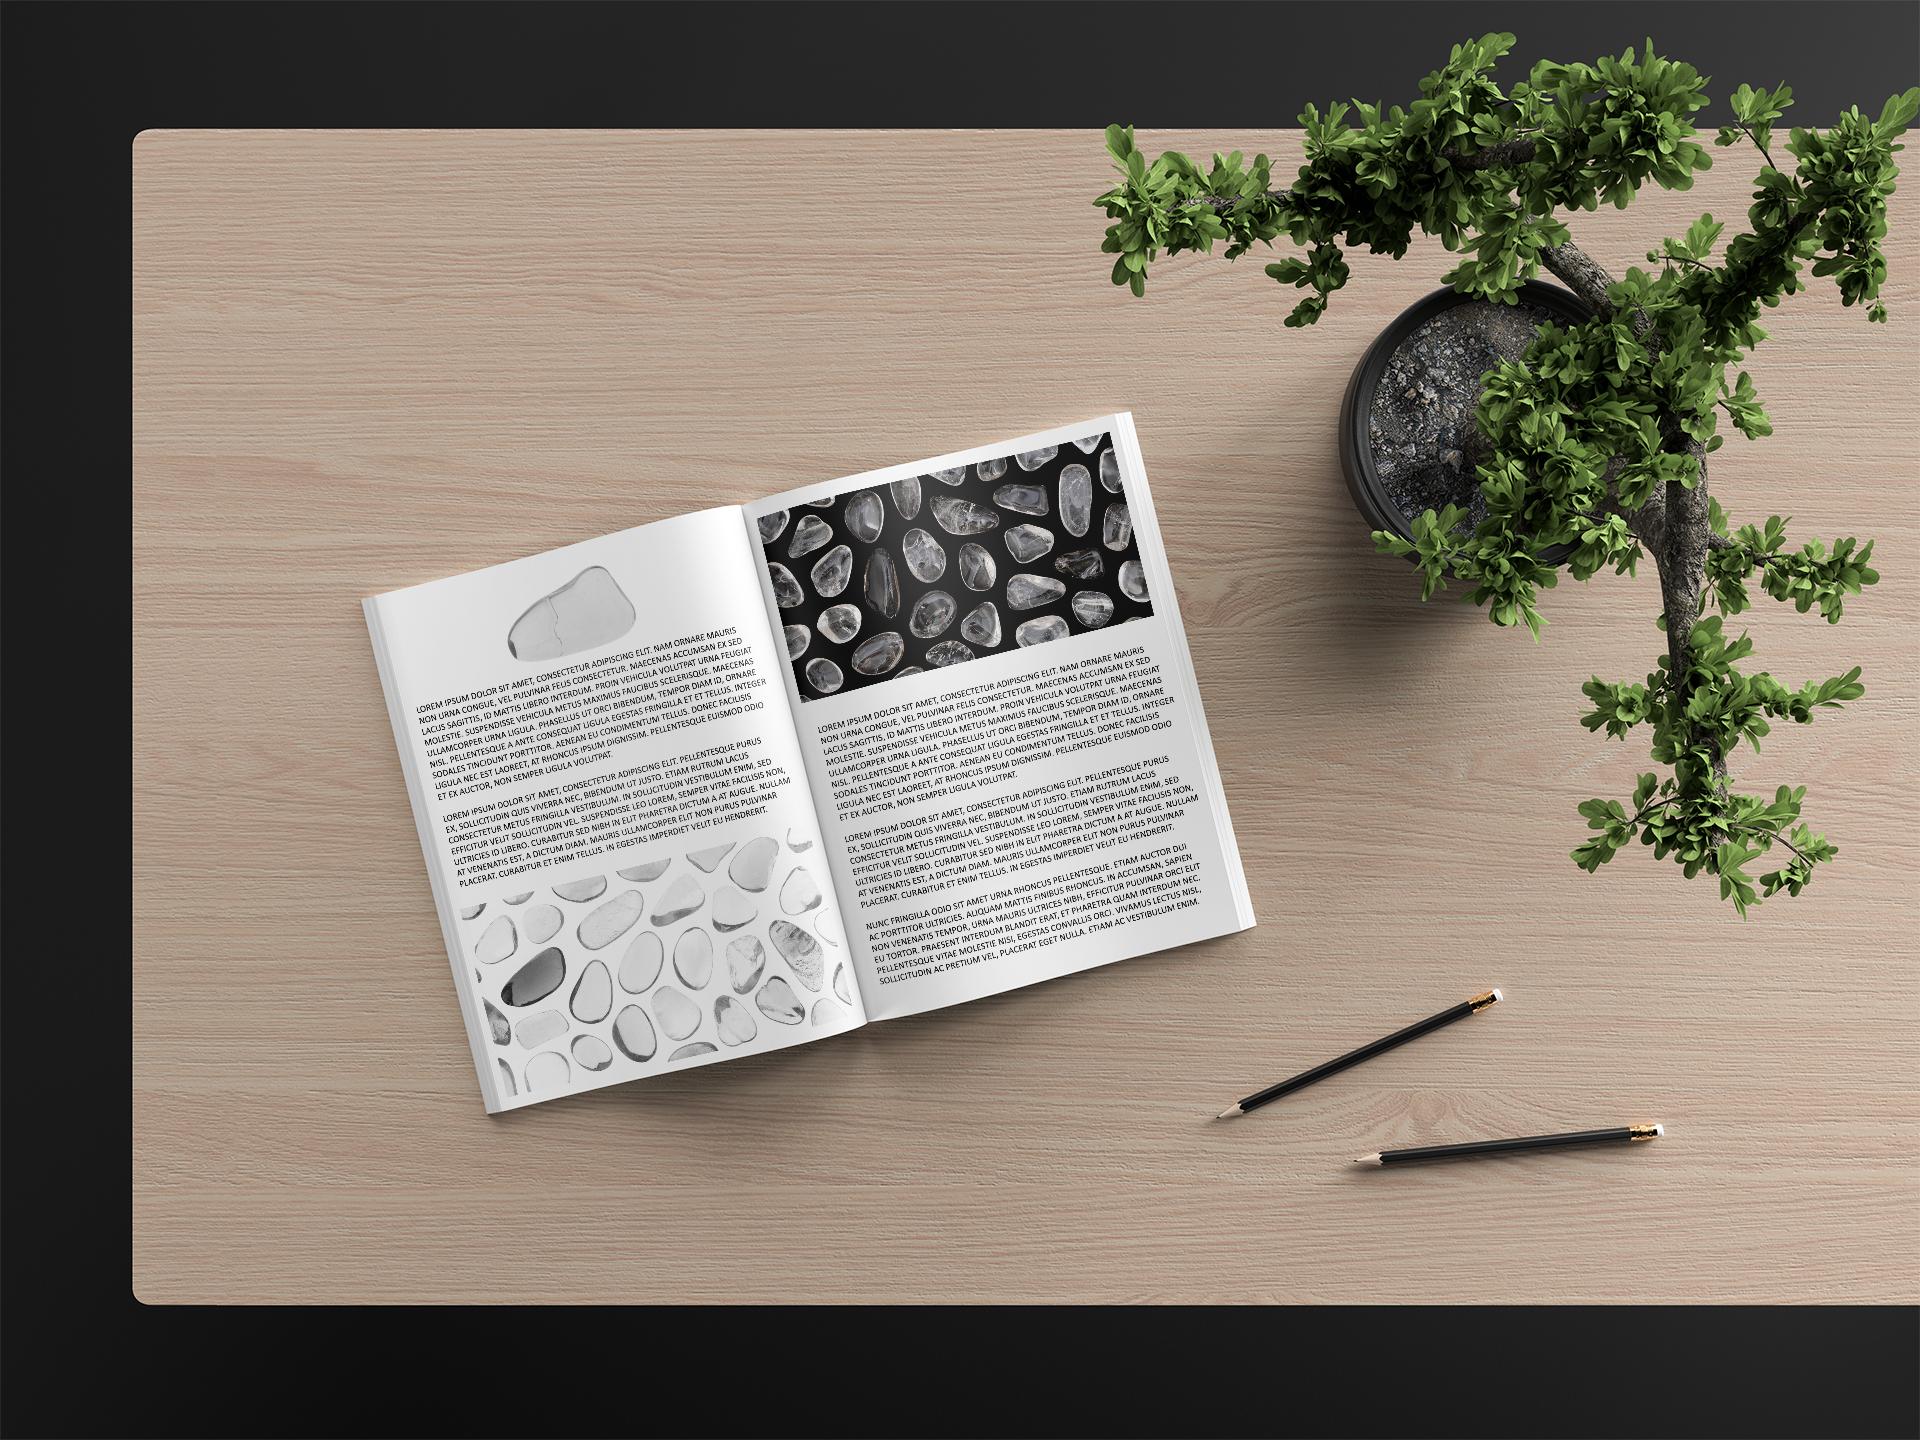 Smoky Quartz Background Textures Modern Magazine Article Illustrations Preview